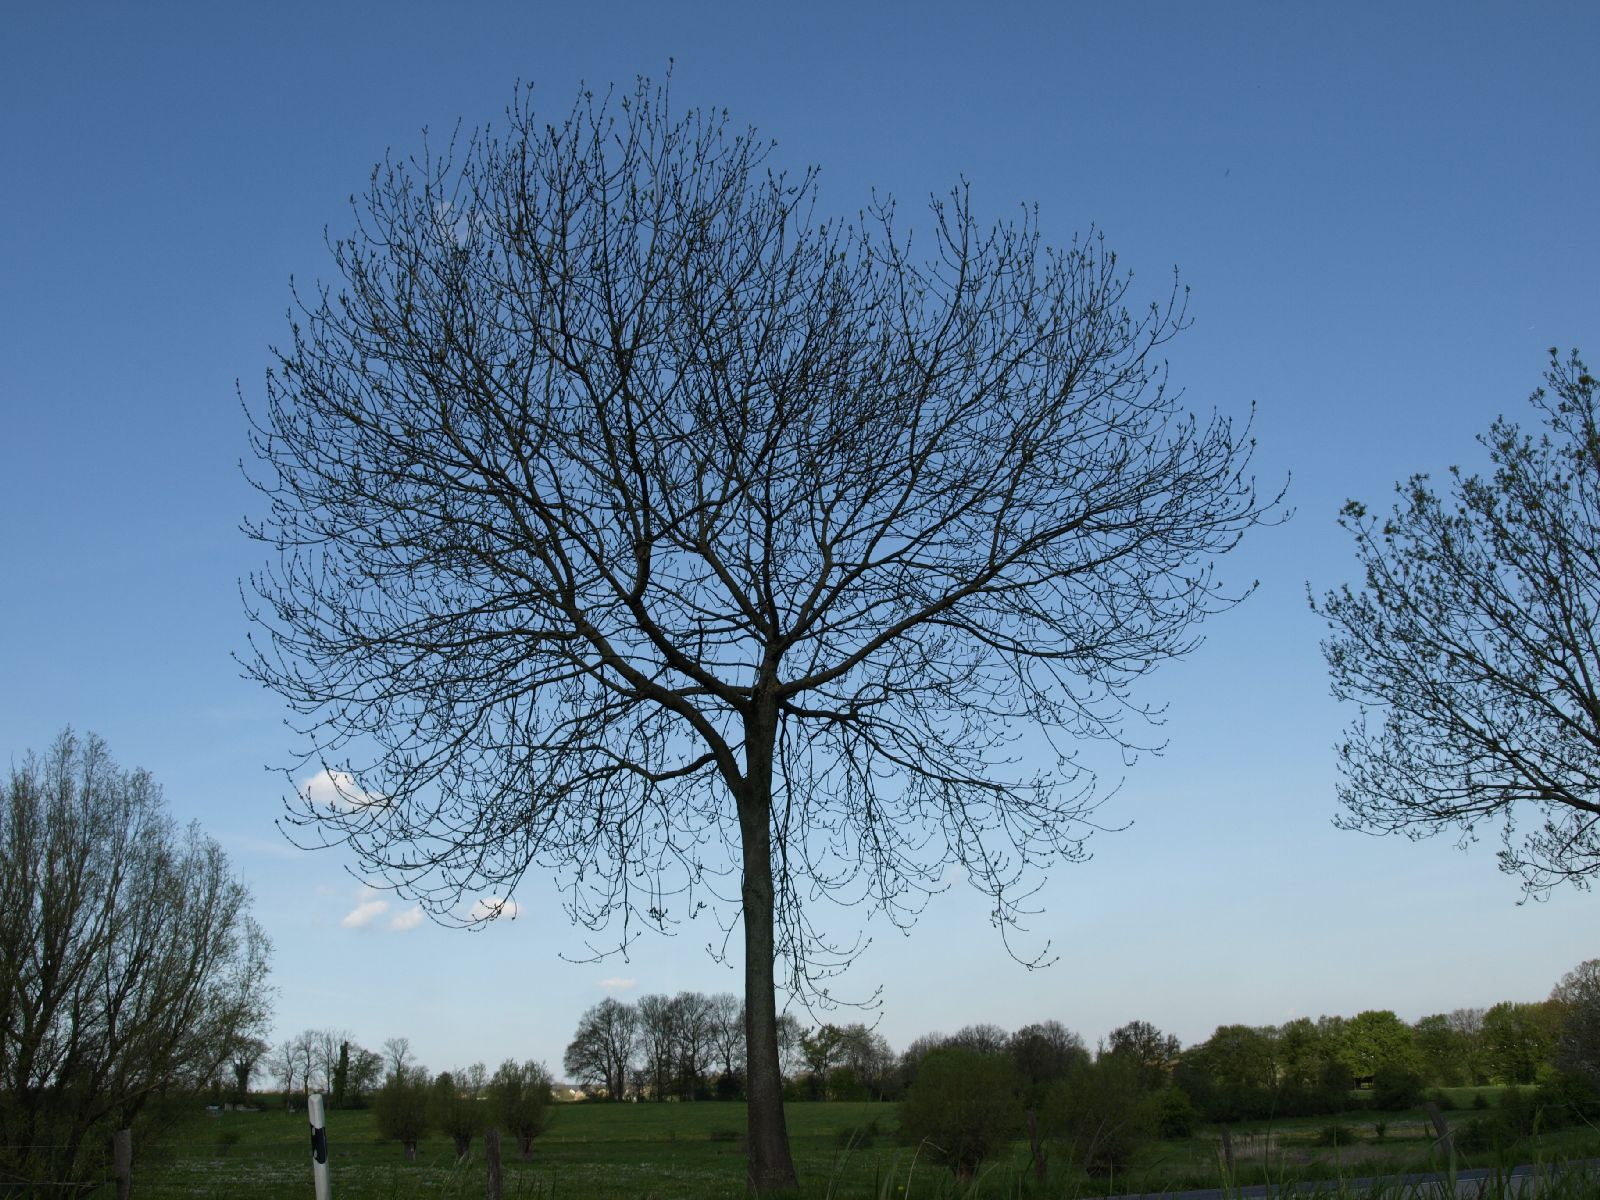 Pflanzen-Baum-Silhouette-Foto_Textur_B_P5032330